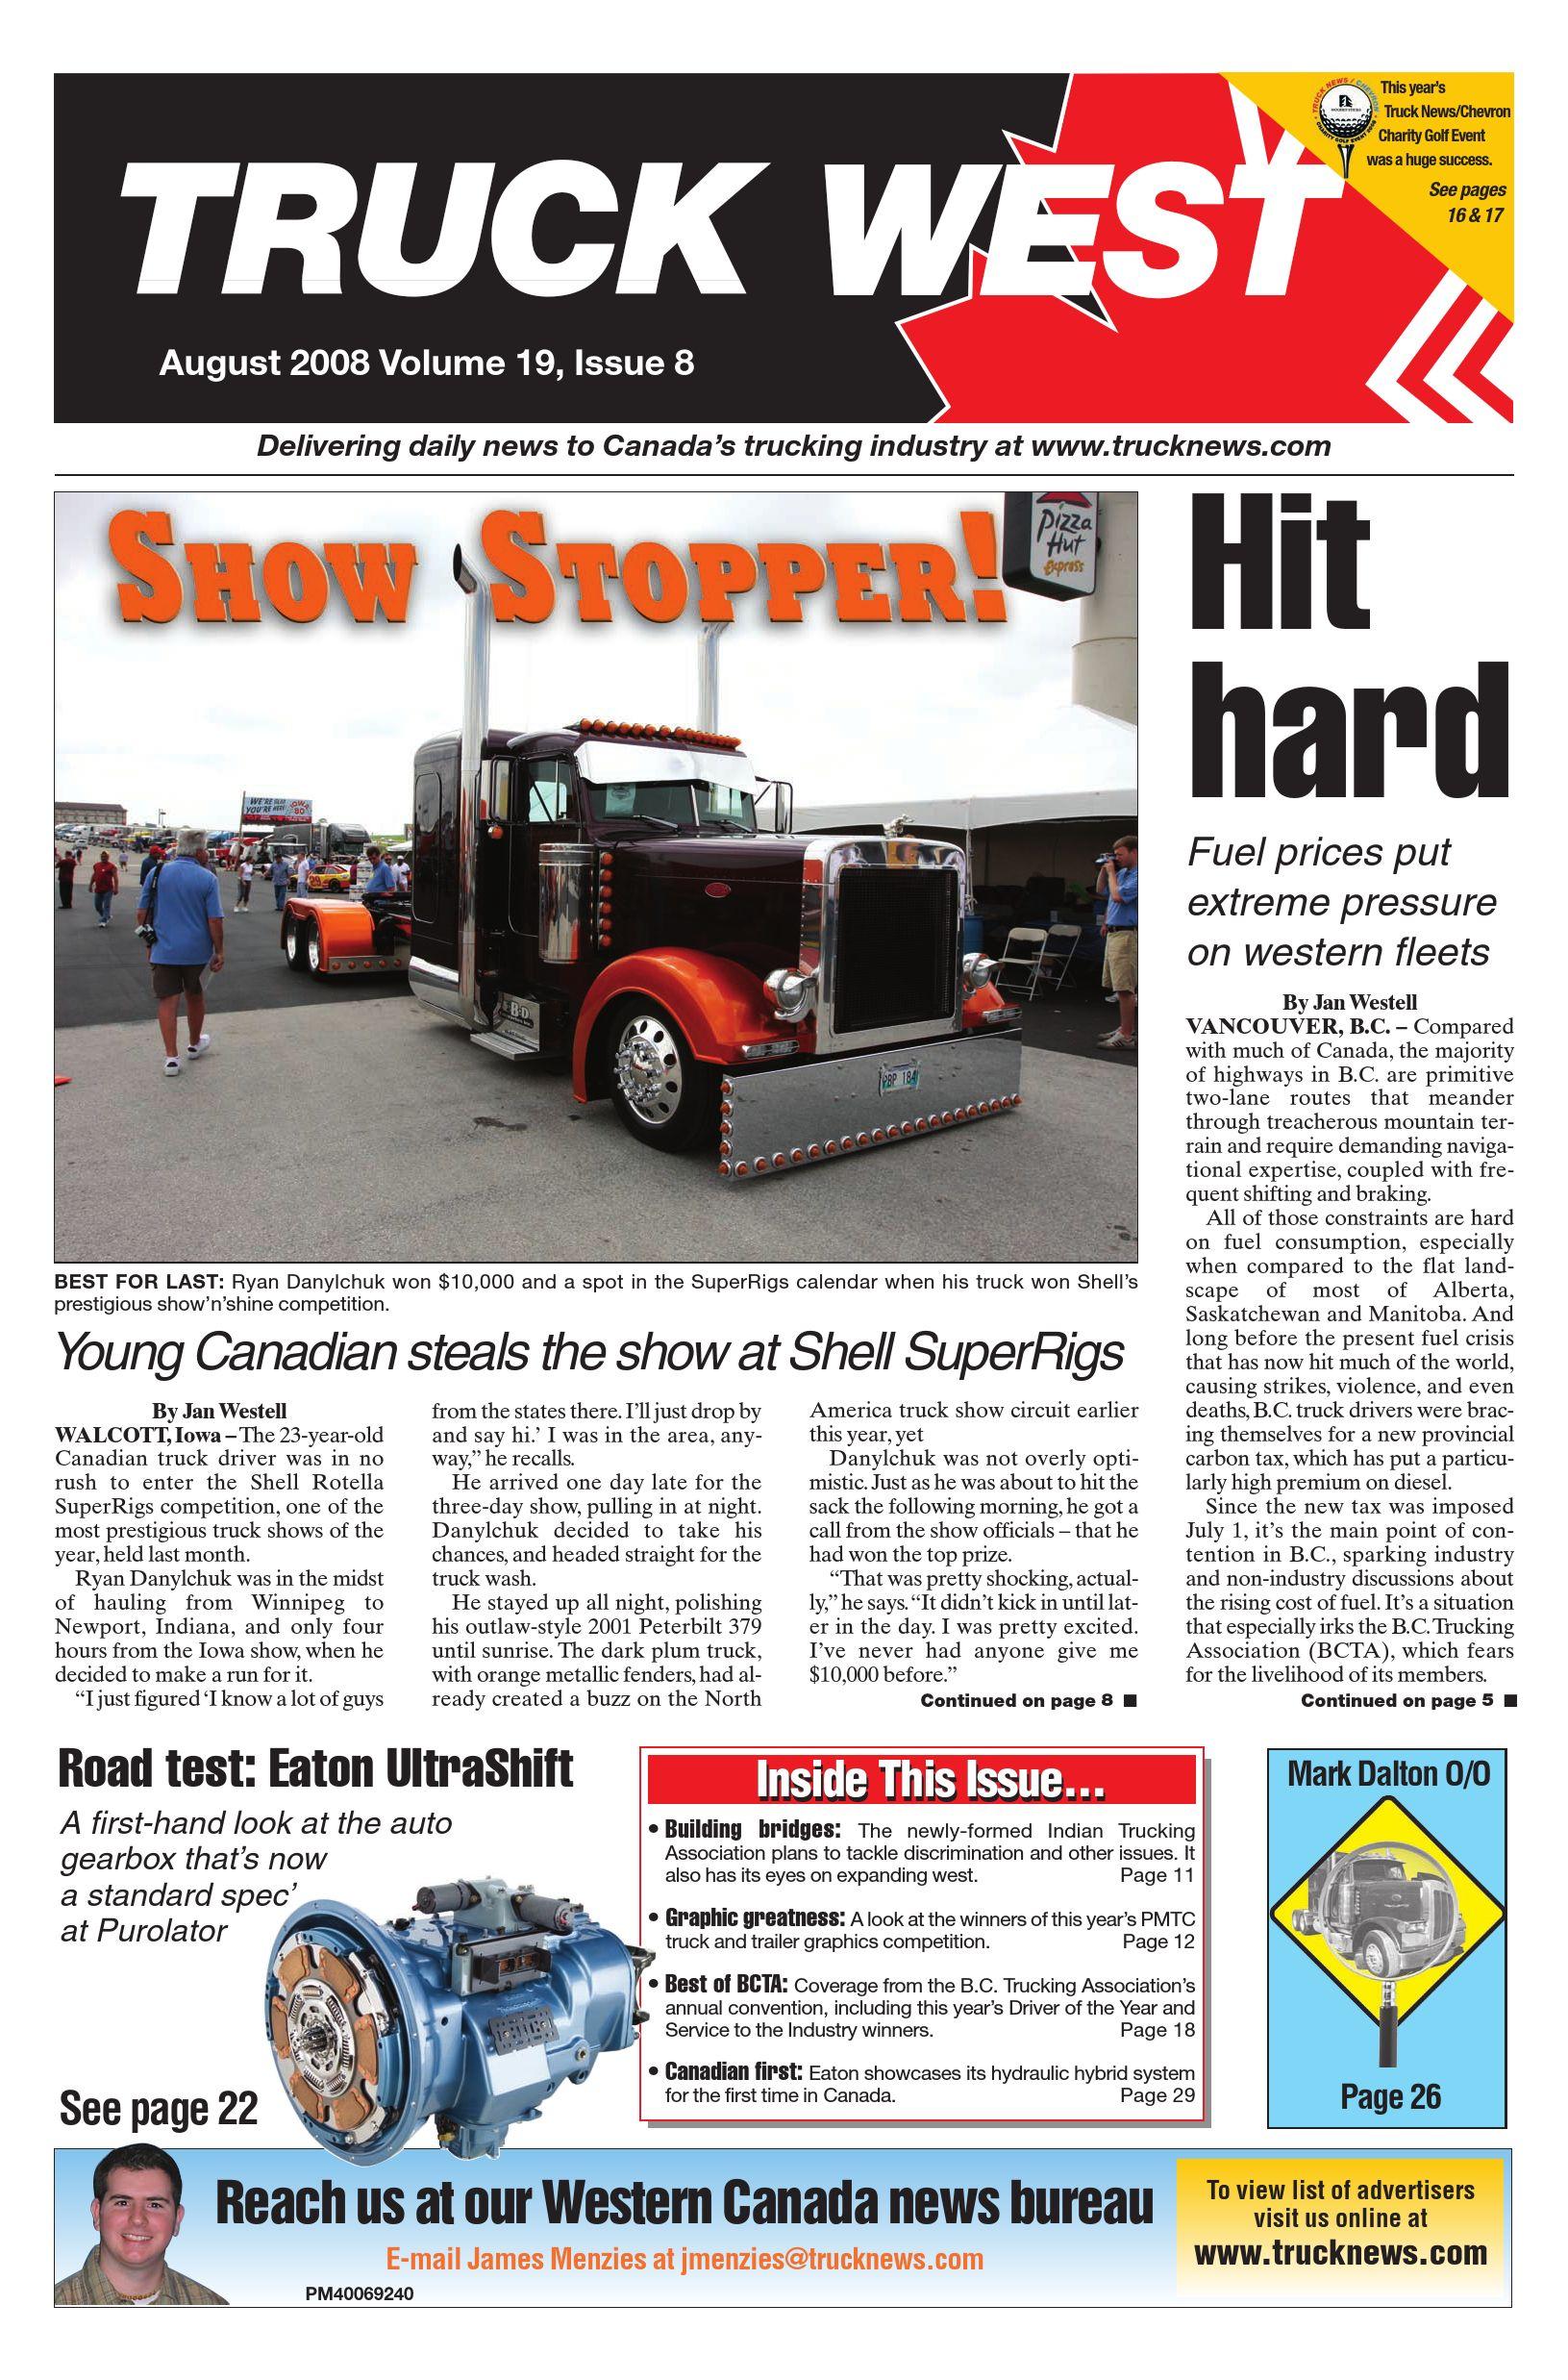 Truck News West – August 2008